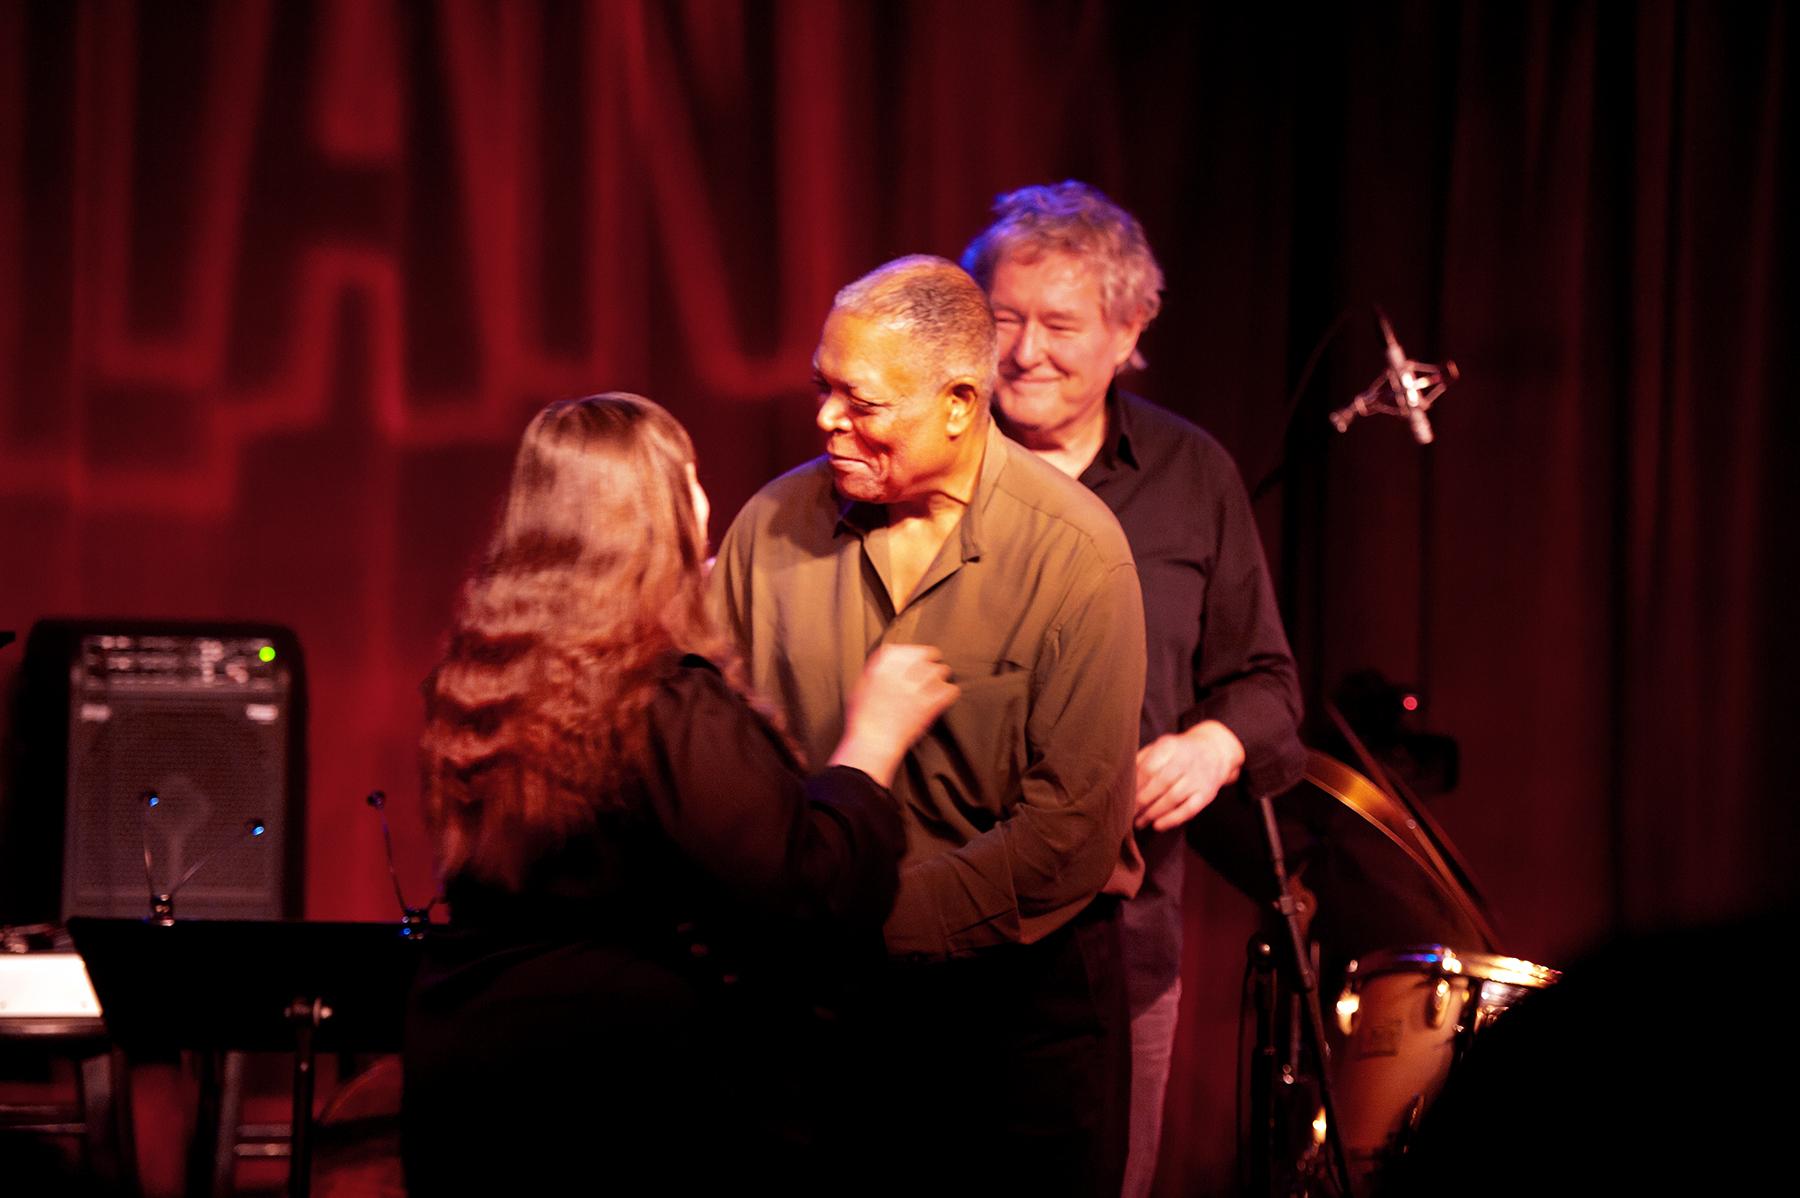 Lions Trio: Yelena Eckemoff, Arild Andersen & Billy Hart ·